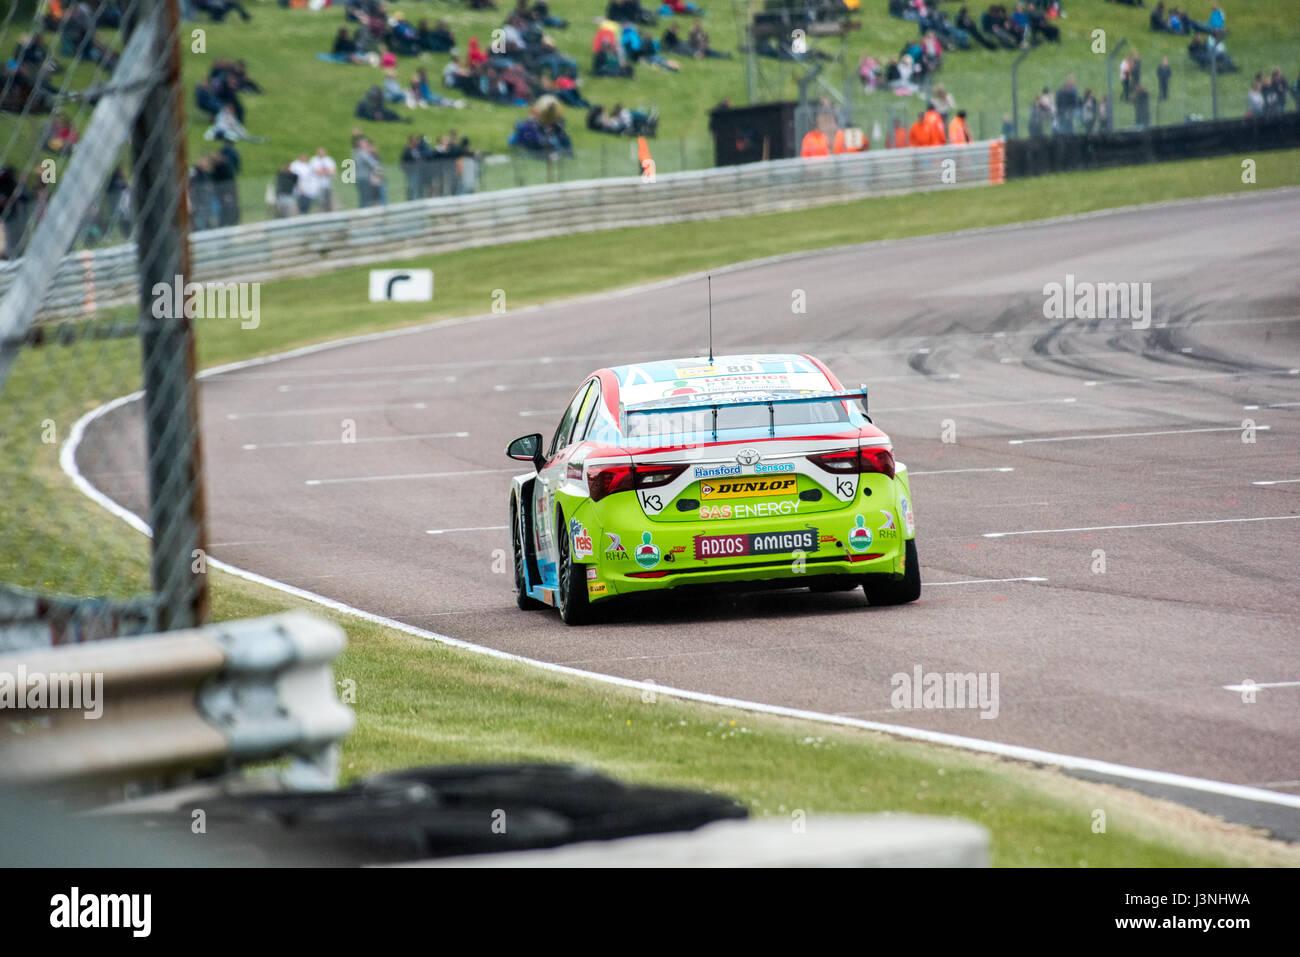 Hampshire, UK. 6th May, 2017. Thruxton Race Circuit and Motorsport Centre, Andover, Hampshire, United Kingdom. 6 - Stock Image